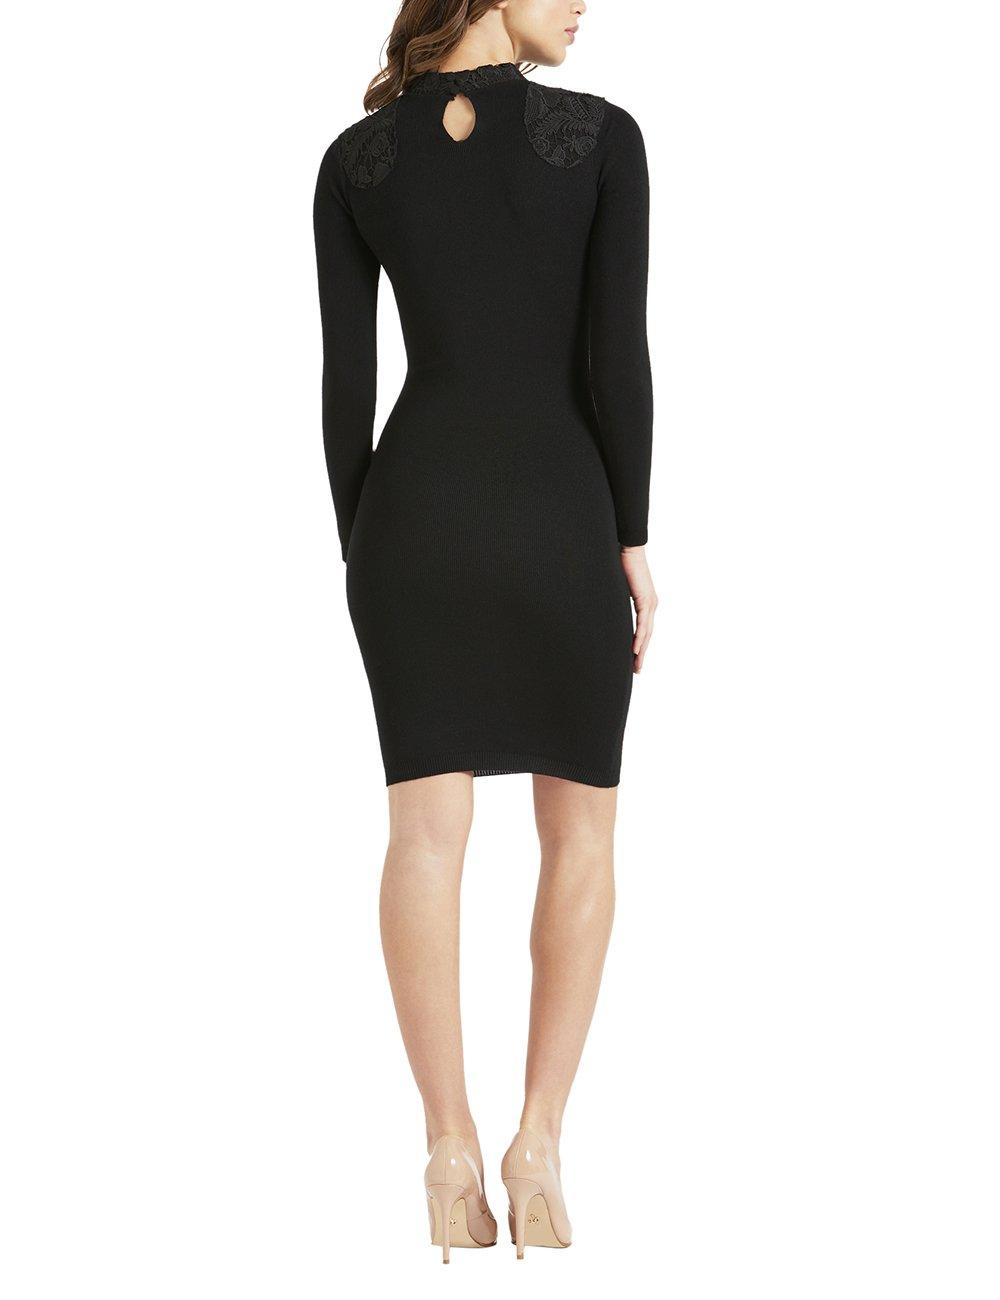 LIPSY Womens Lace Appliquà Dress Black US 10 (UK 14) by LIPSY (Image #5)